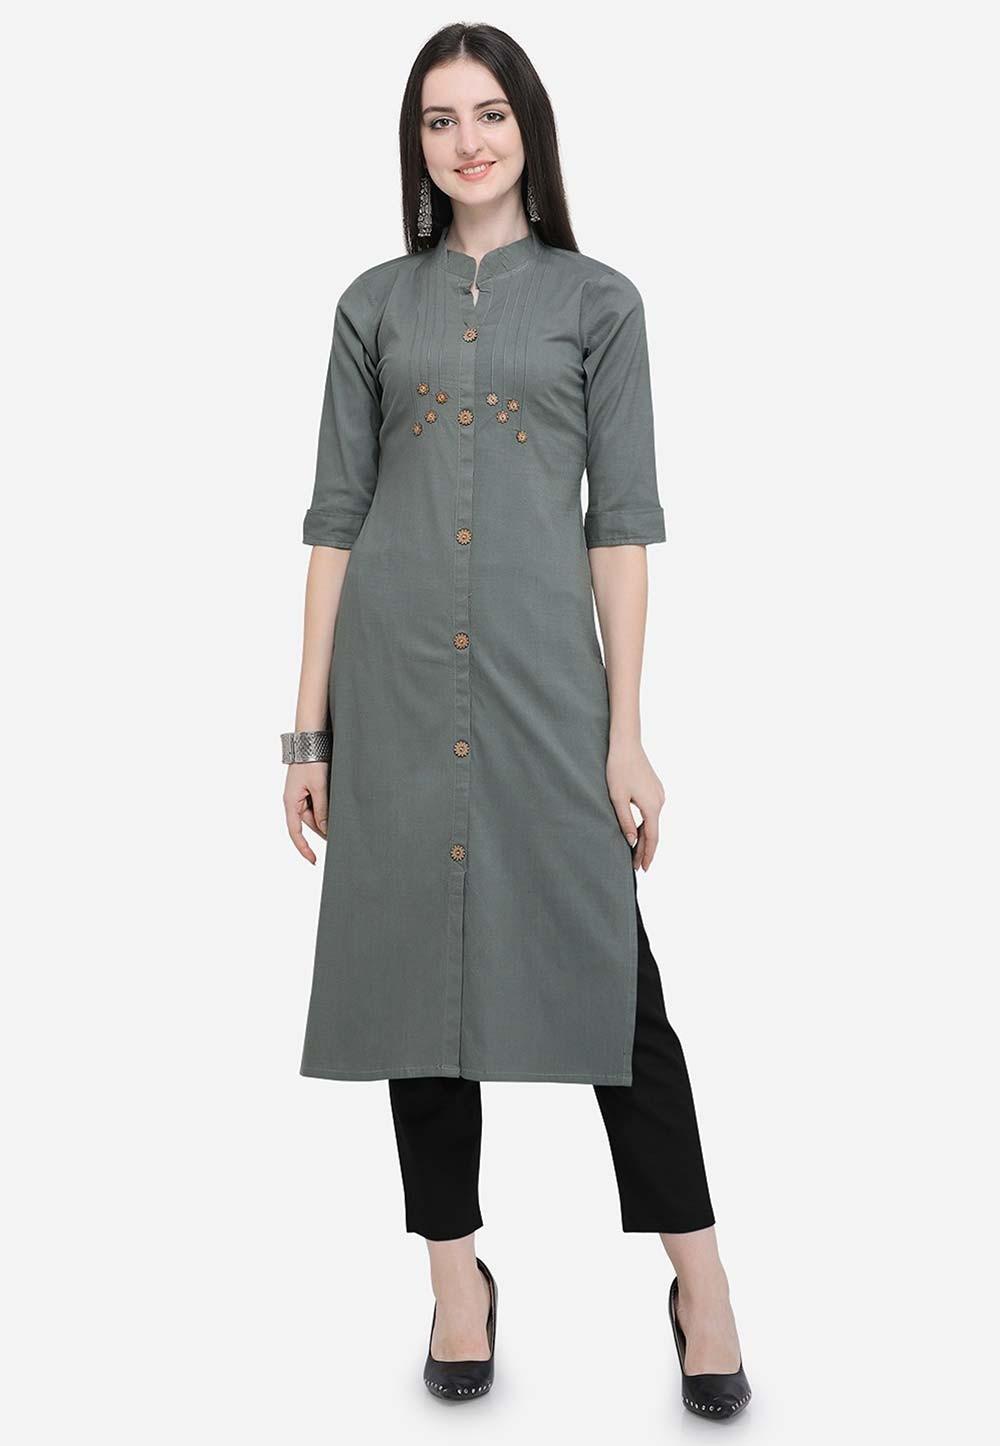 Grey Colour Casual Kurti.